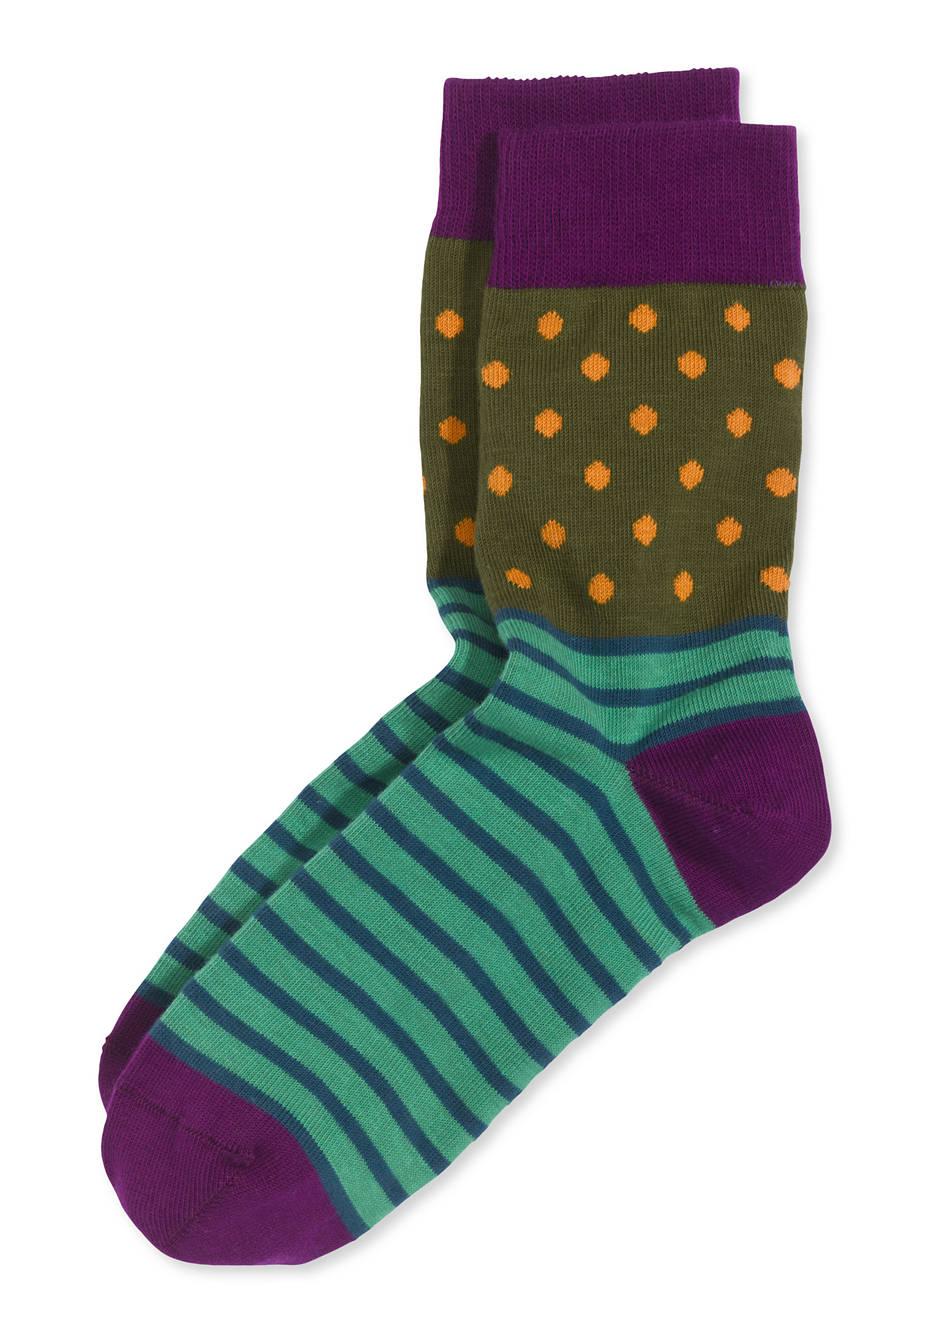 Damen Mustermix-Socke aus Bio-Baumwolle